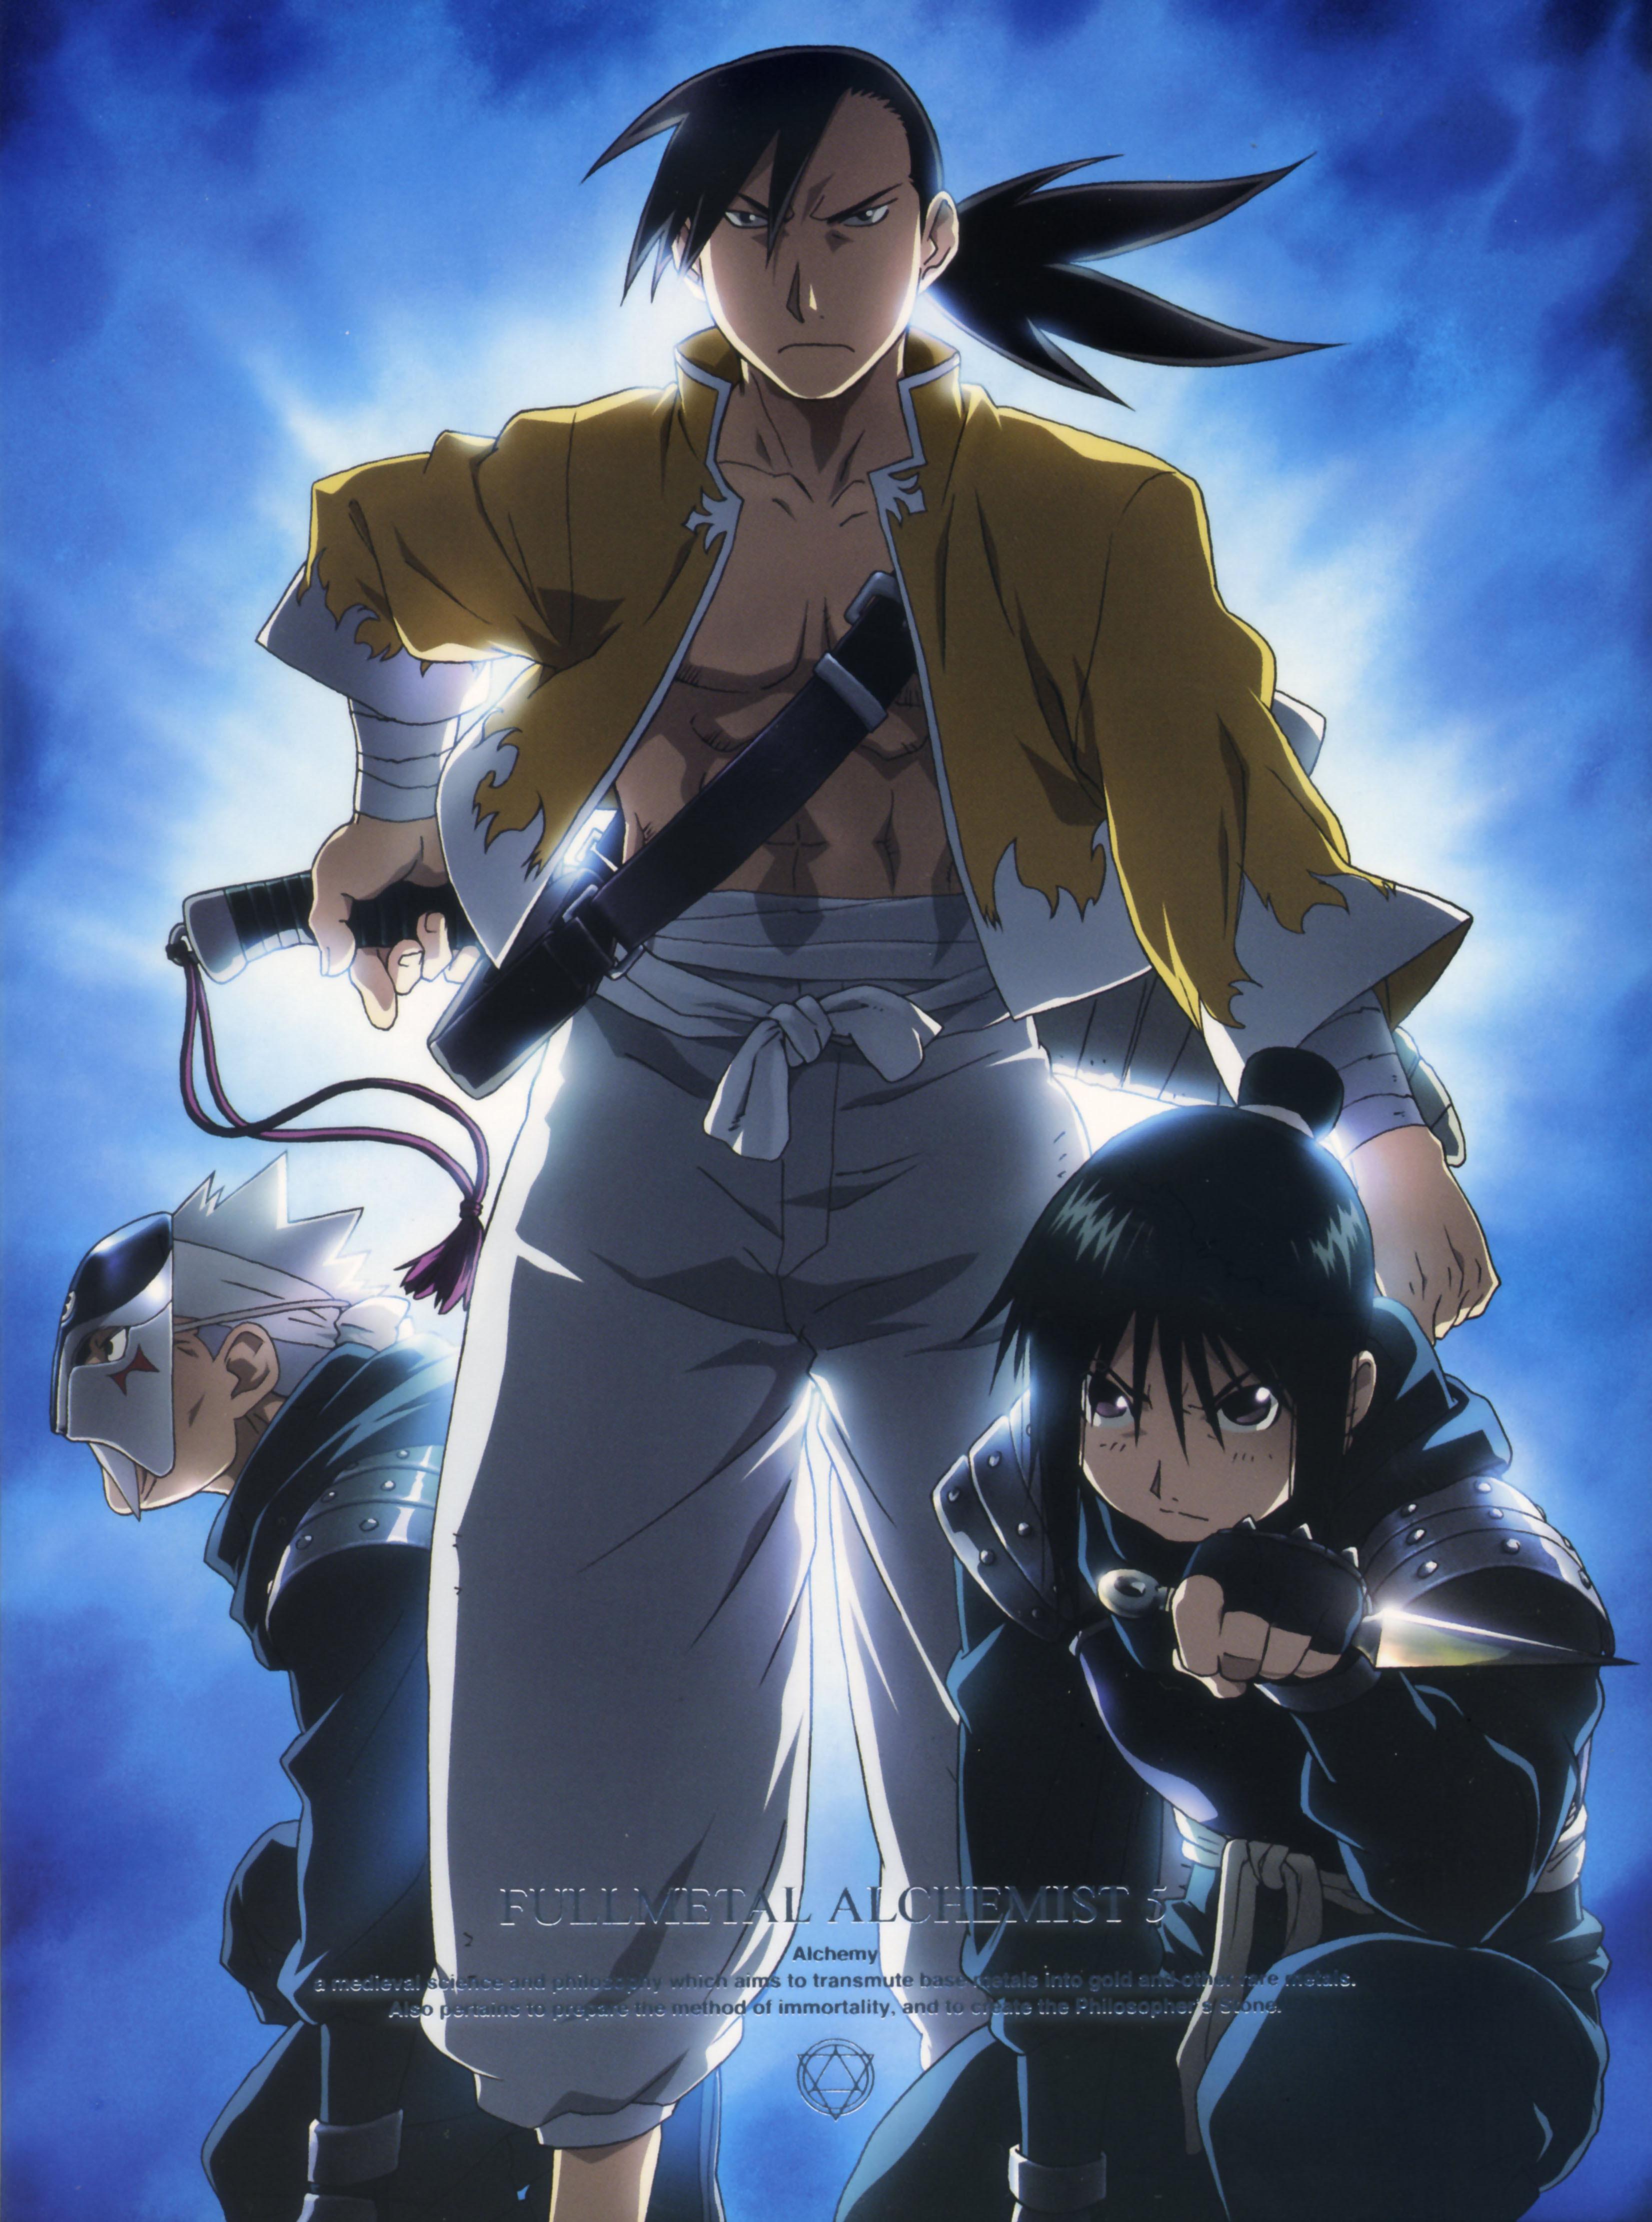 Fullmetal Alchemist Brotherhood/#639069 - Zerochan